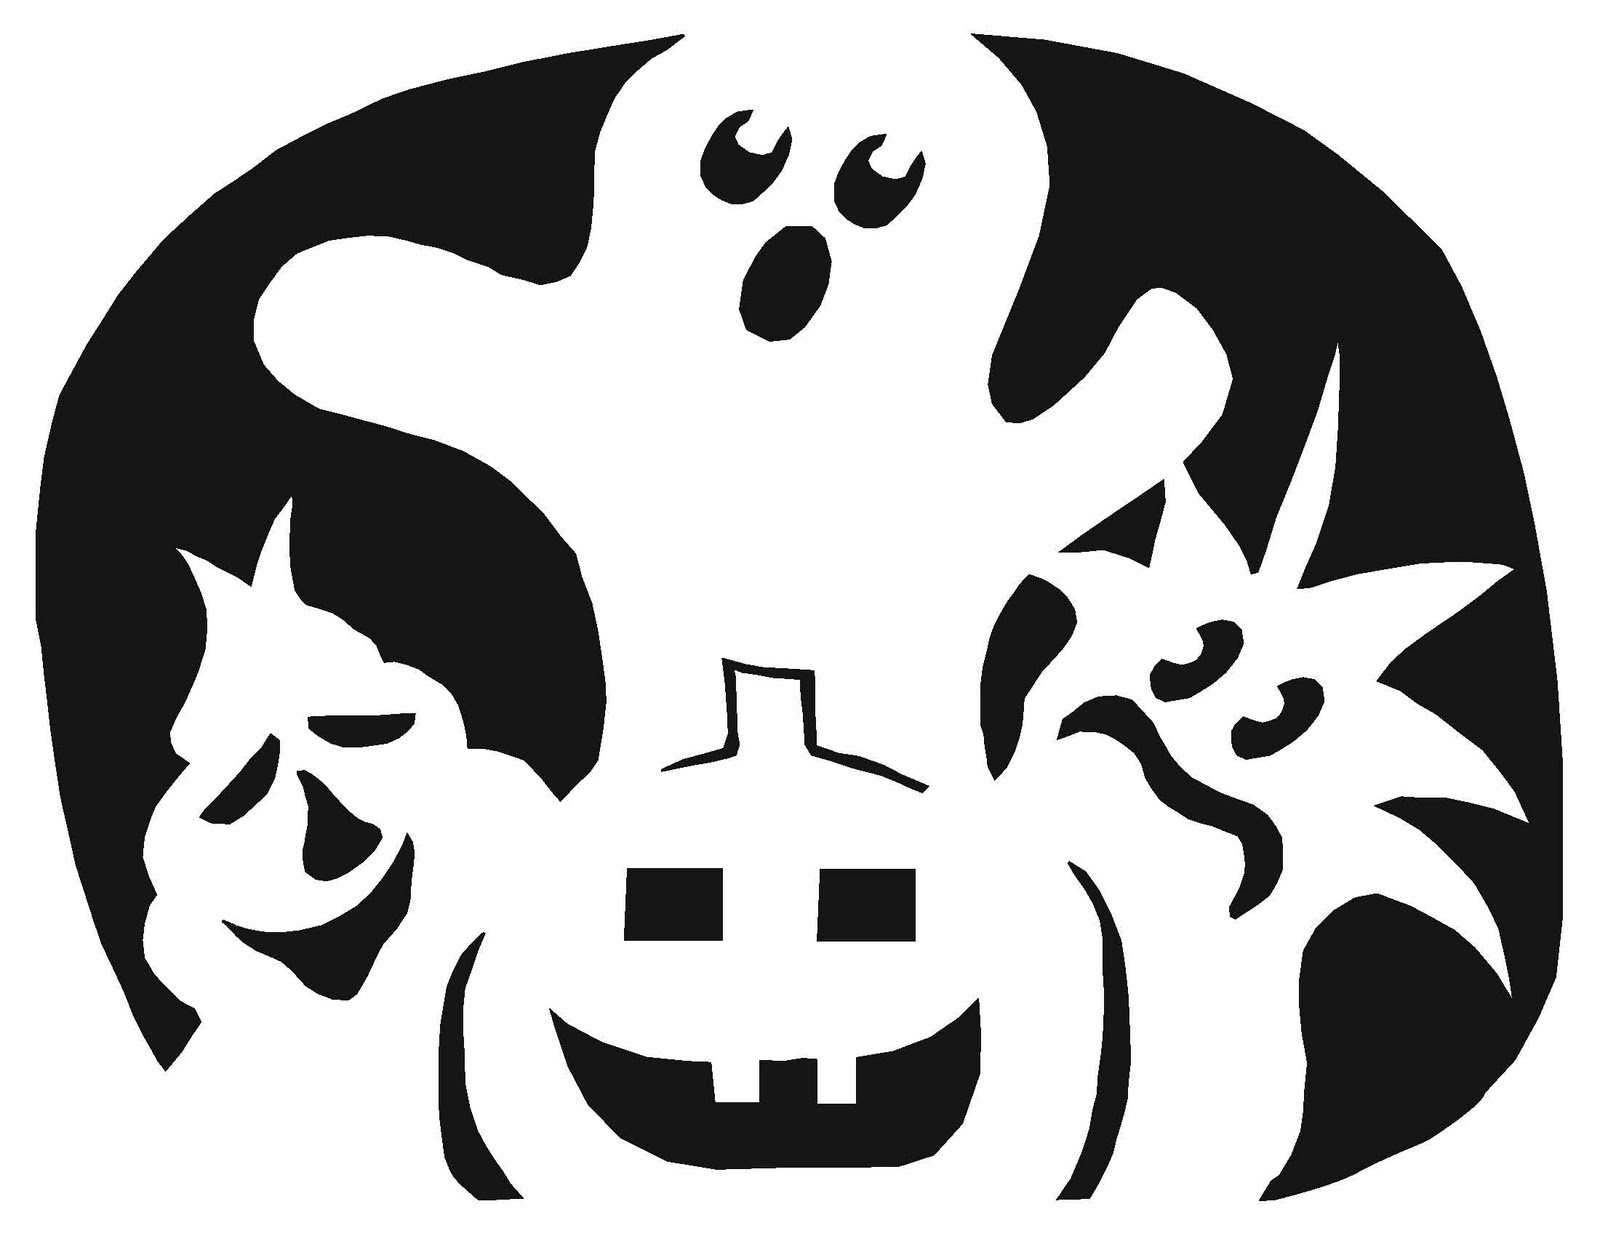 Free Guitar Pumpkin Stencil, Download Free Clip Art, Free Clip Art - Free Printable Pumpkin Stencils